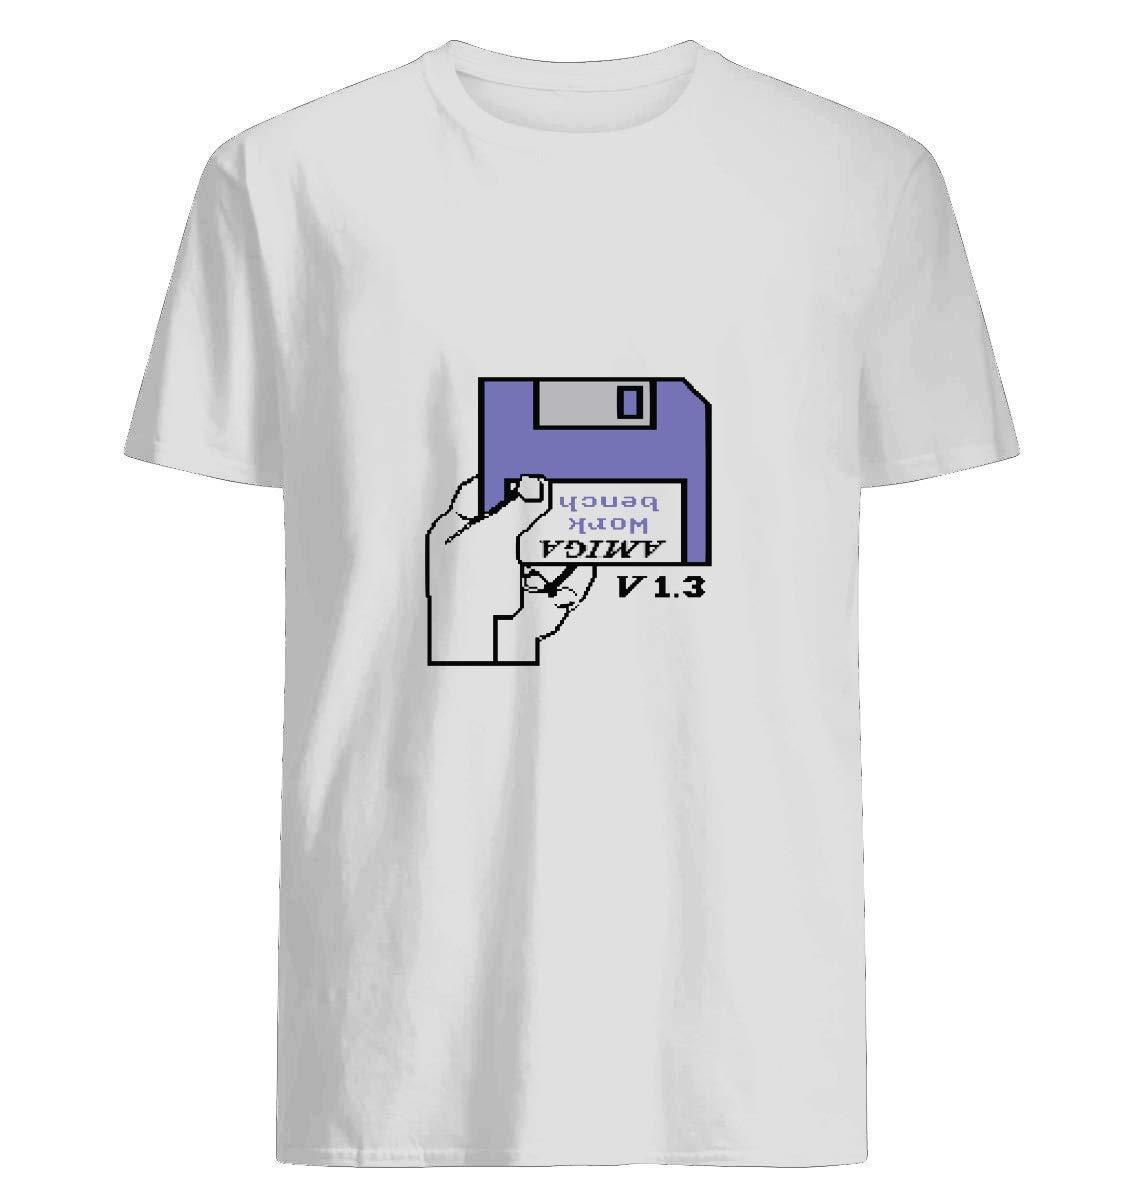 Amiga Workbench Os T Shirt For Unisex